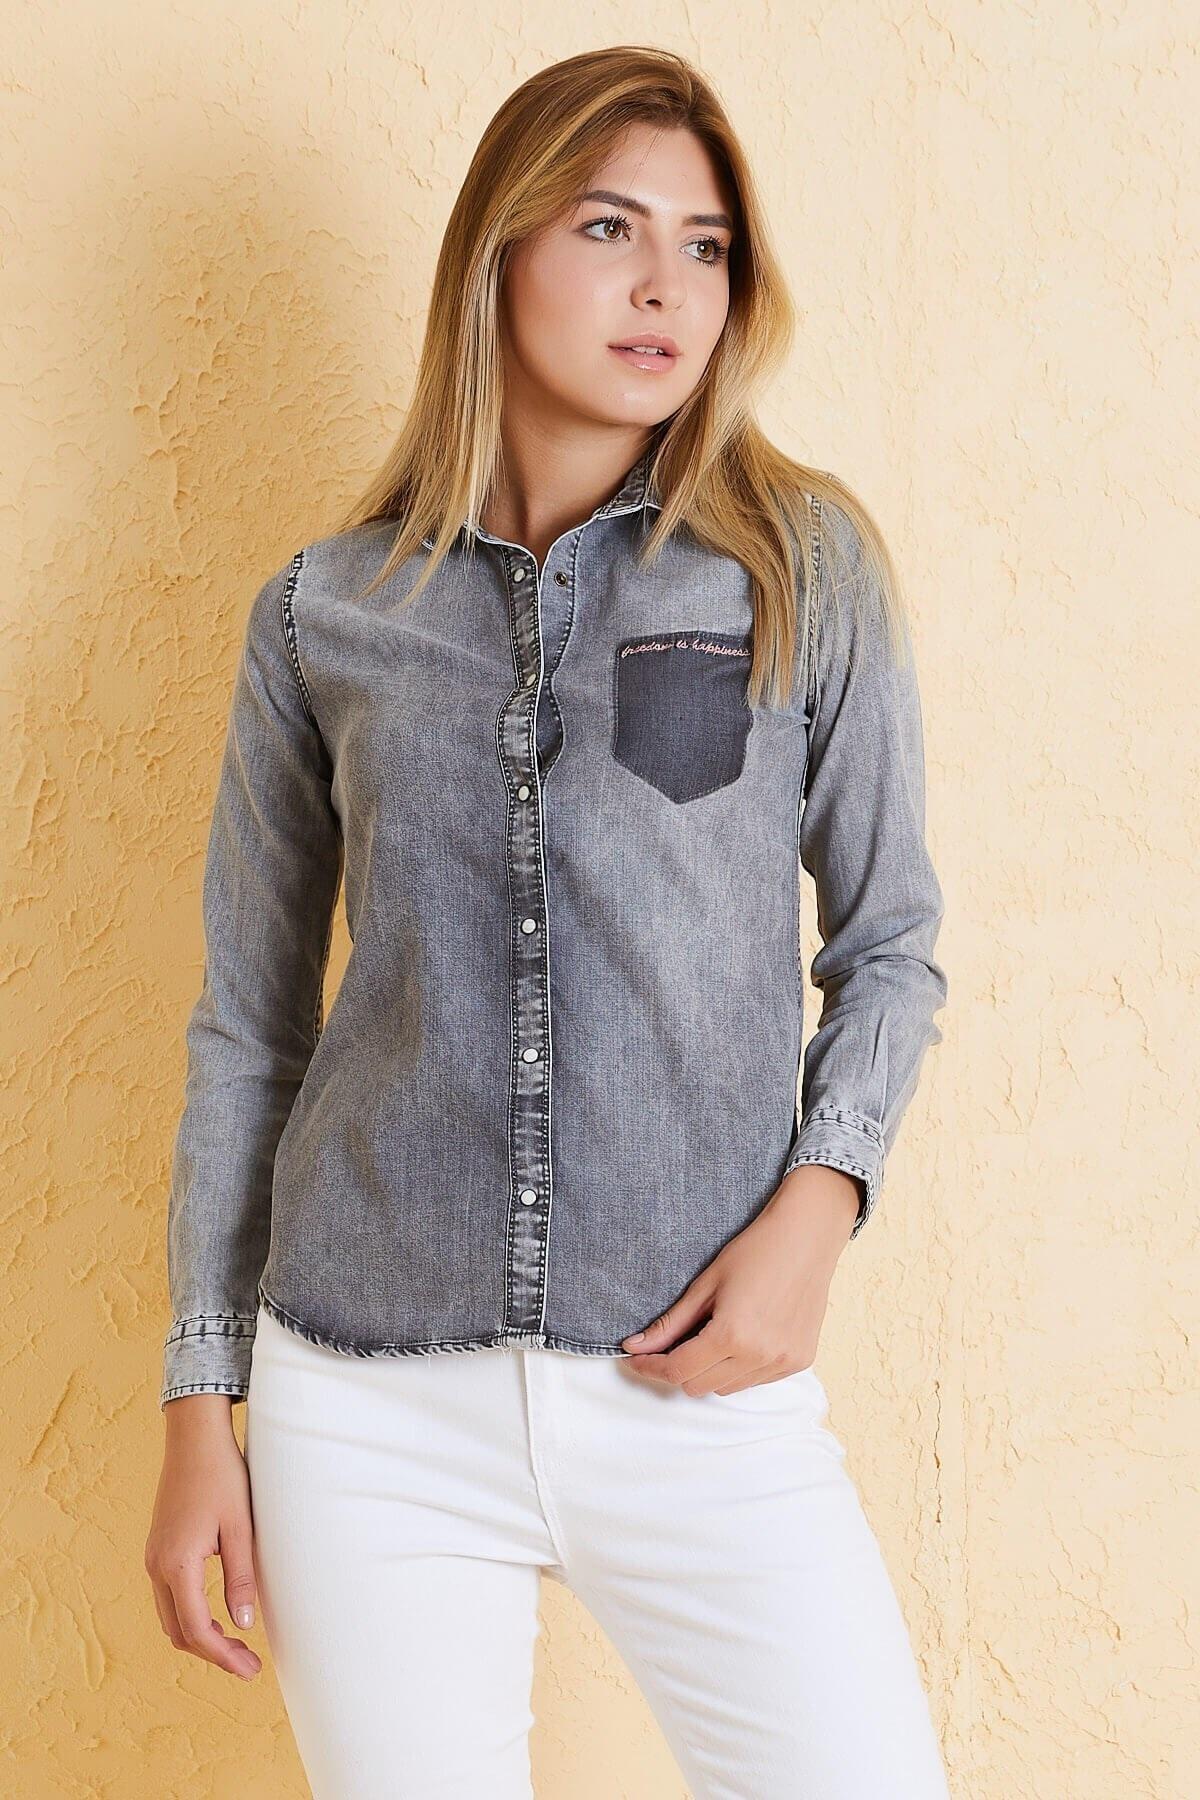 Twister Jeans Kadın Slim Fit Gömlek Bg 810-01 (T-y) 01 2